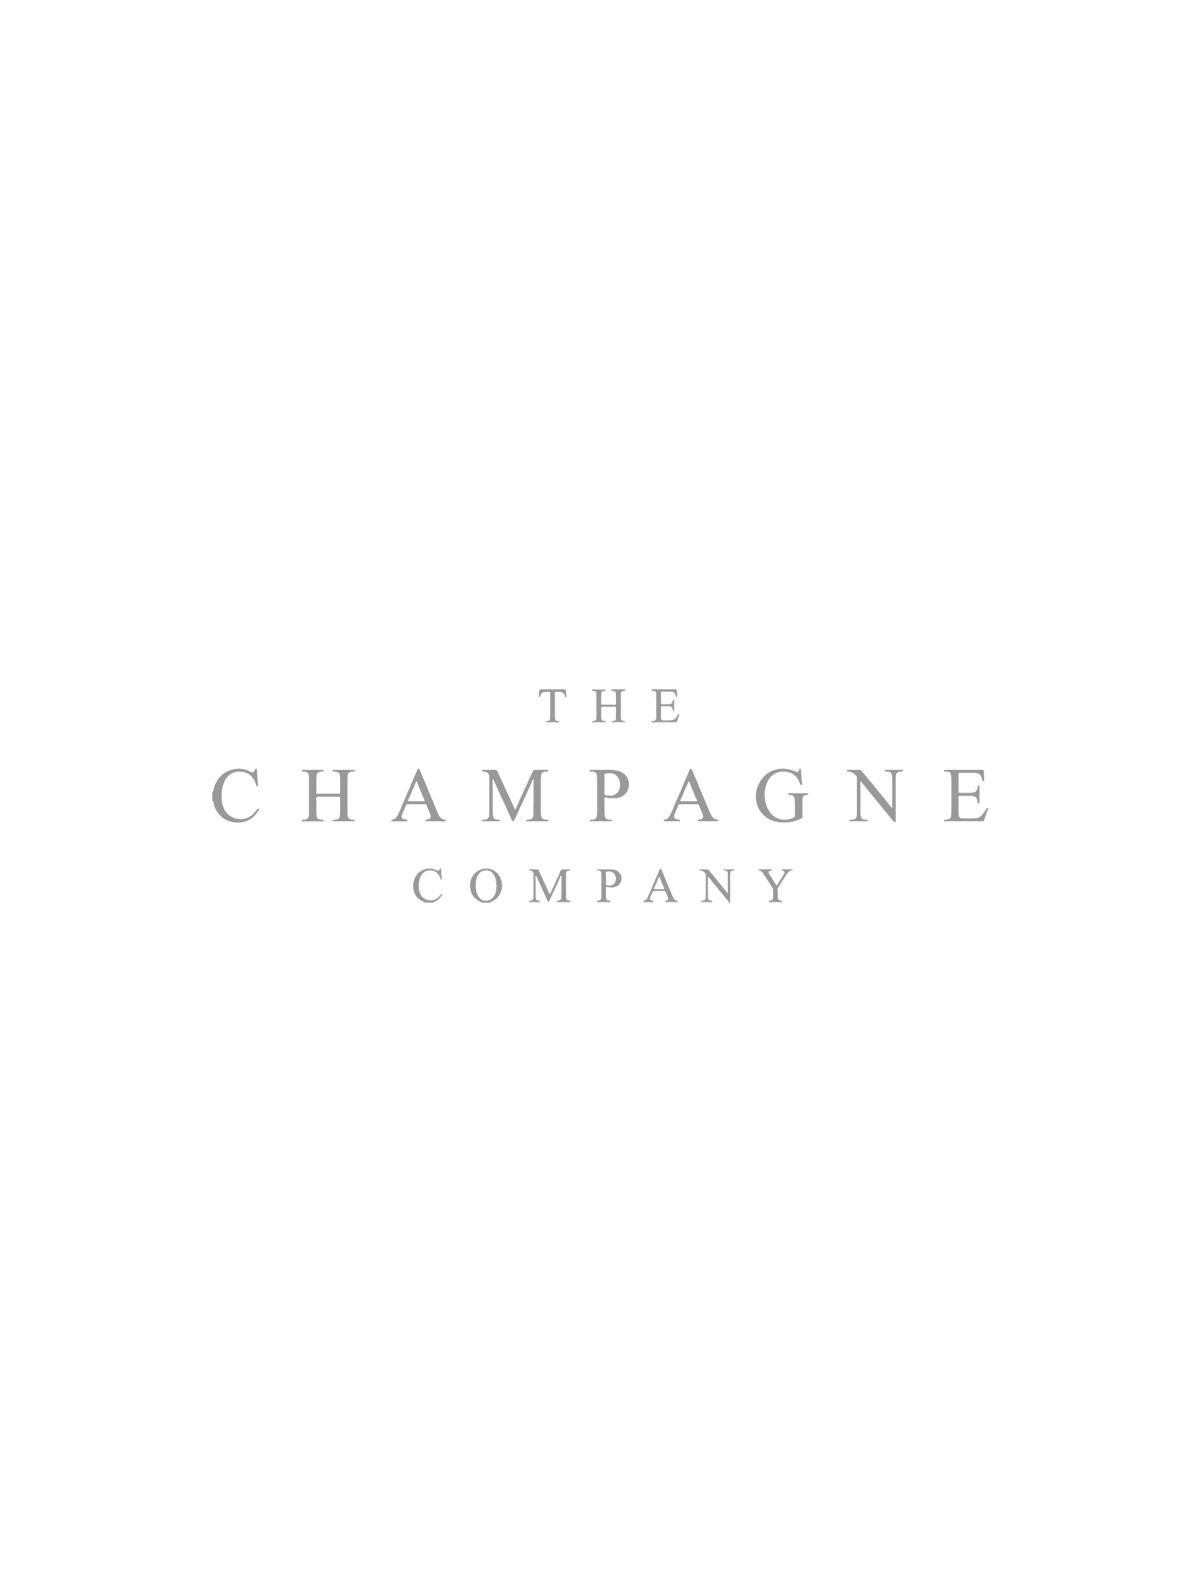 Veuve Clicquot Ponsardin Brut NV Champagne Case Deal 6x 75cl